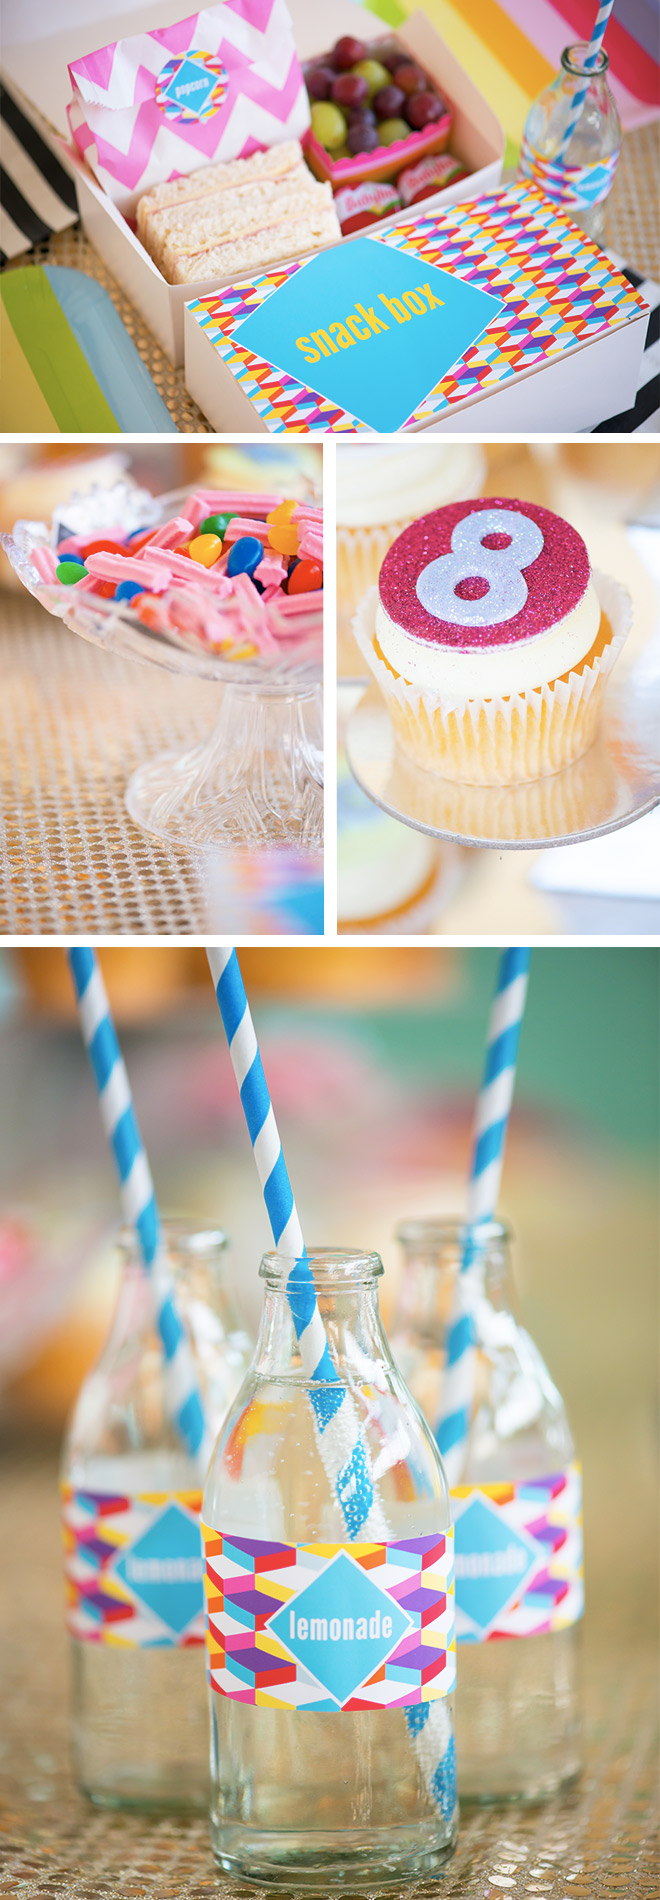 Disco Party Food Ideas - Sparkling cupcakes, fizzy lemondae and sweet honeyjoys